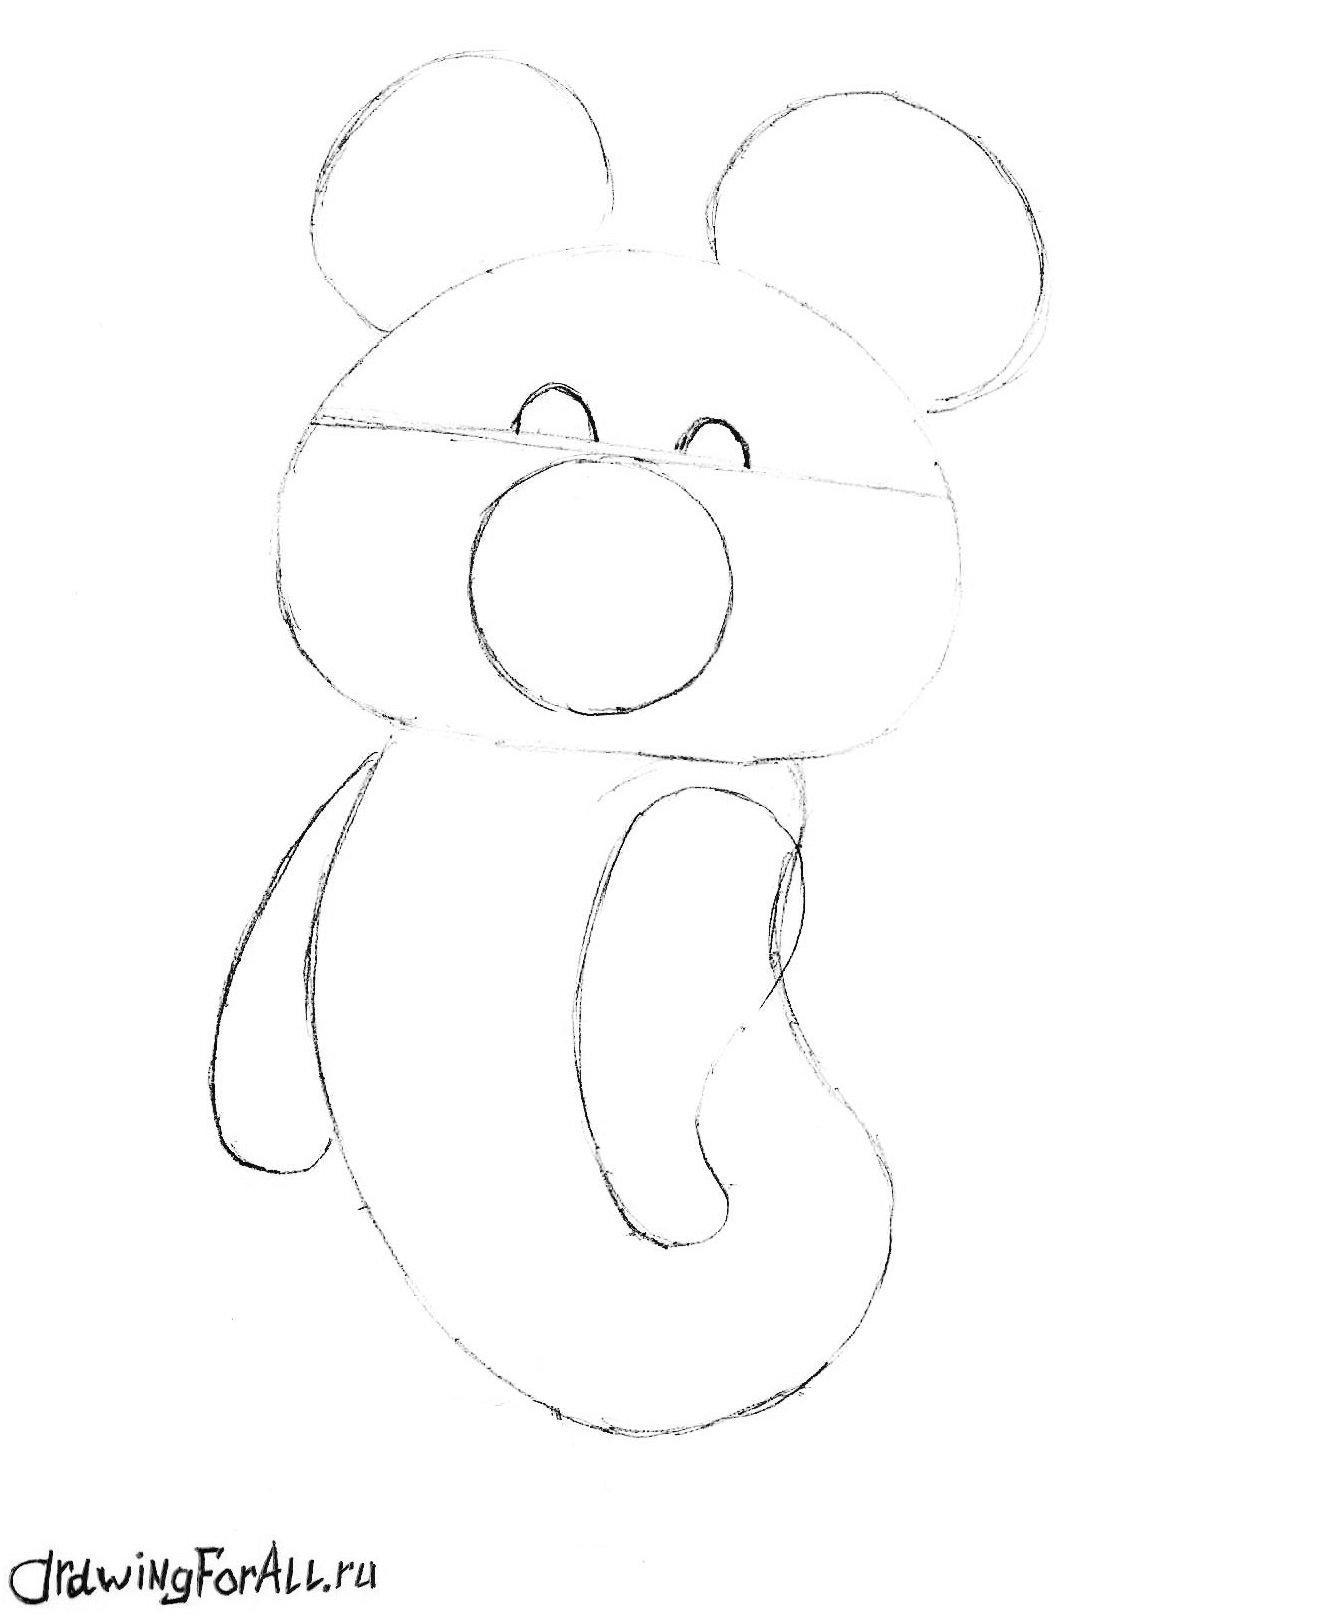 олимпийский мишка нарисованный